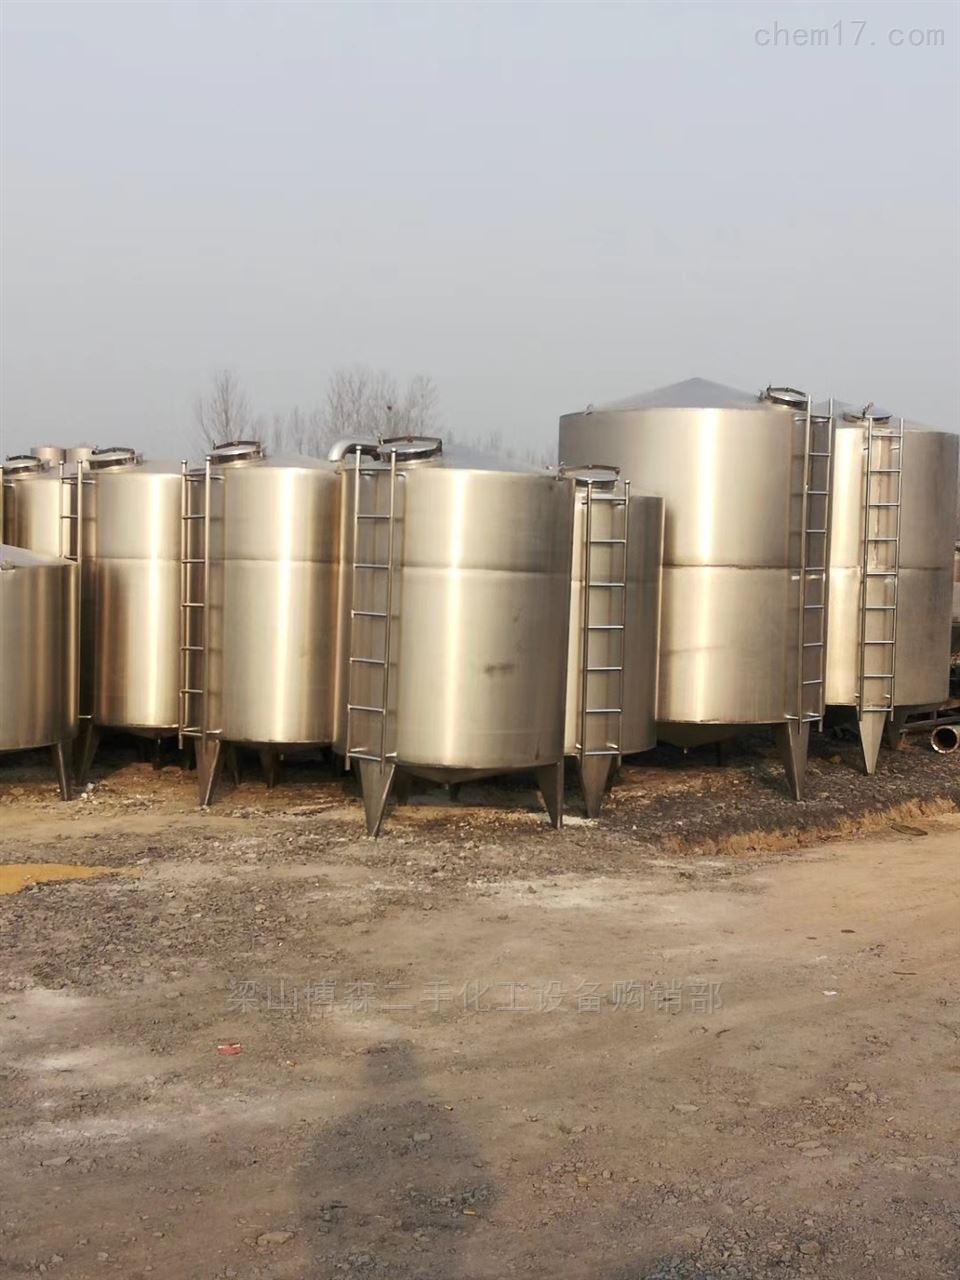 500L出售二手超电加热搅拌罐